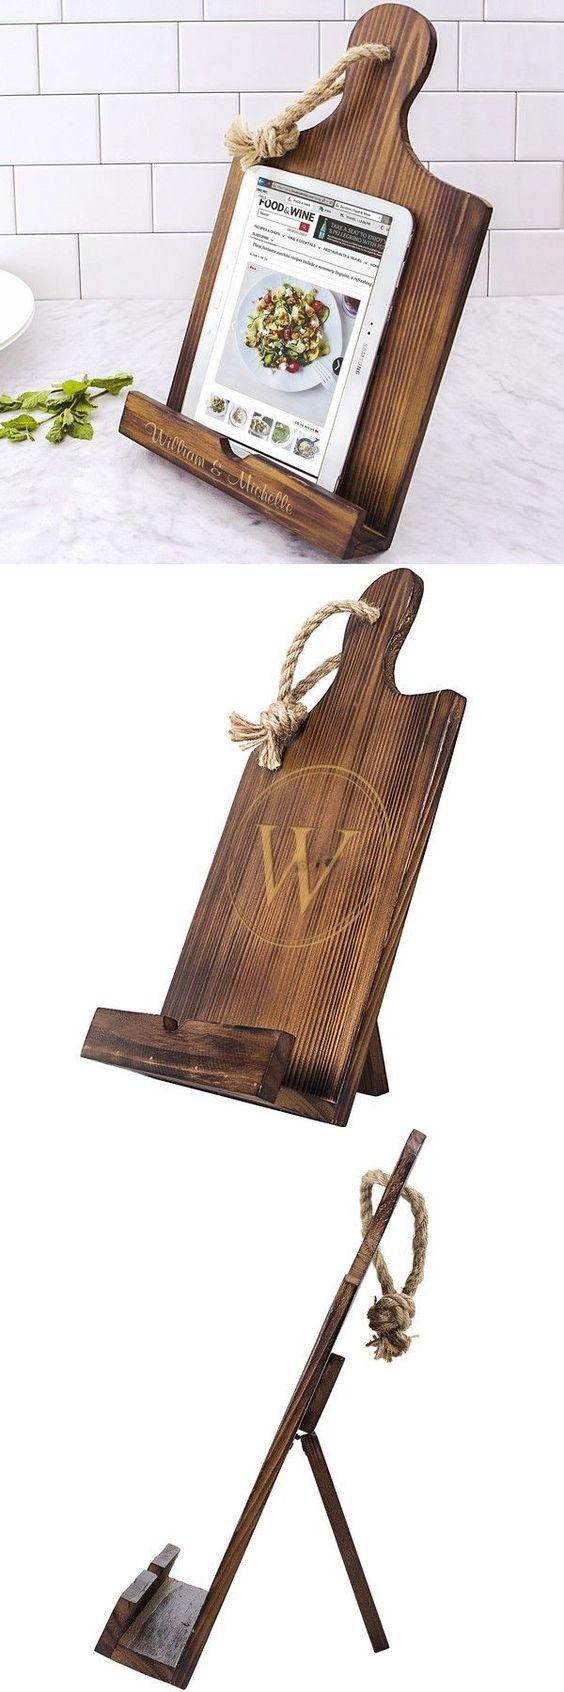 Wooden Stand 5 Simphome com